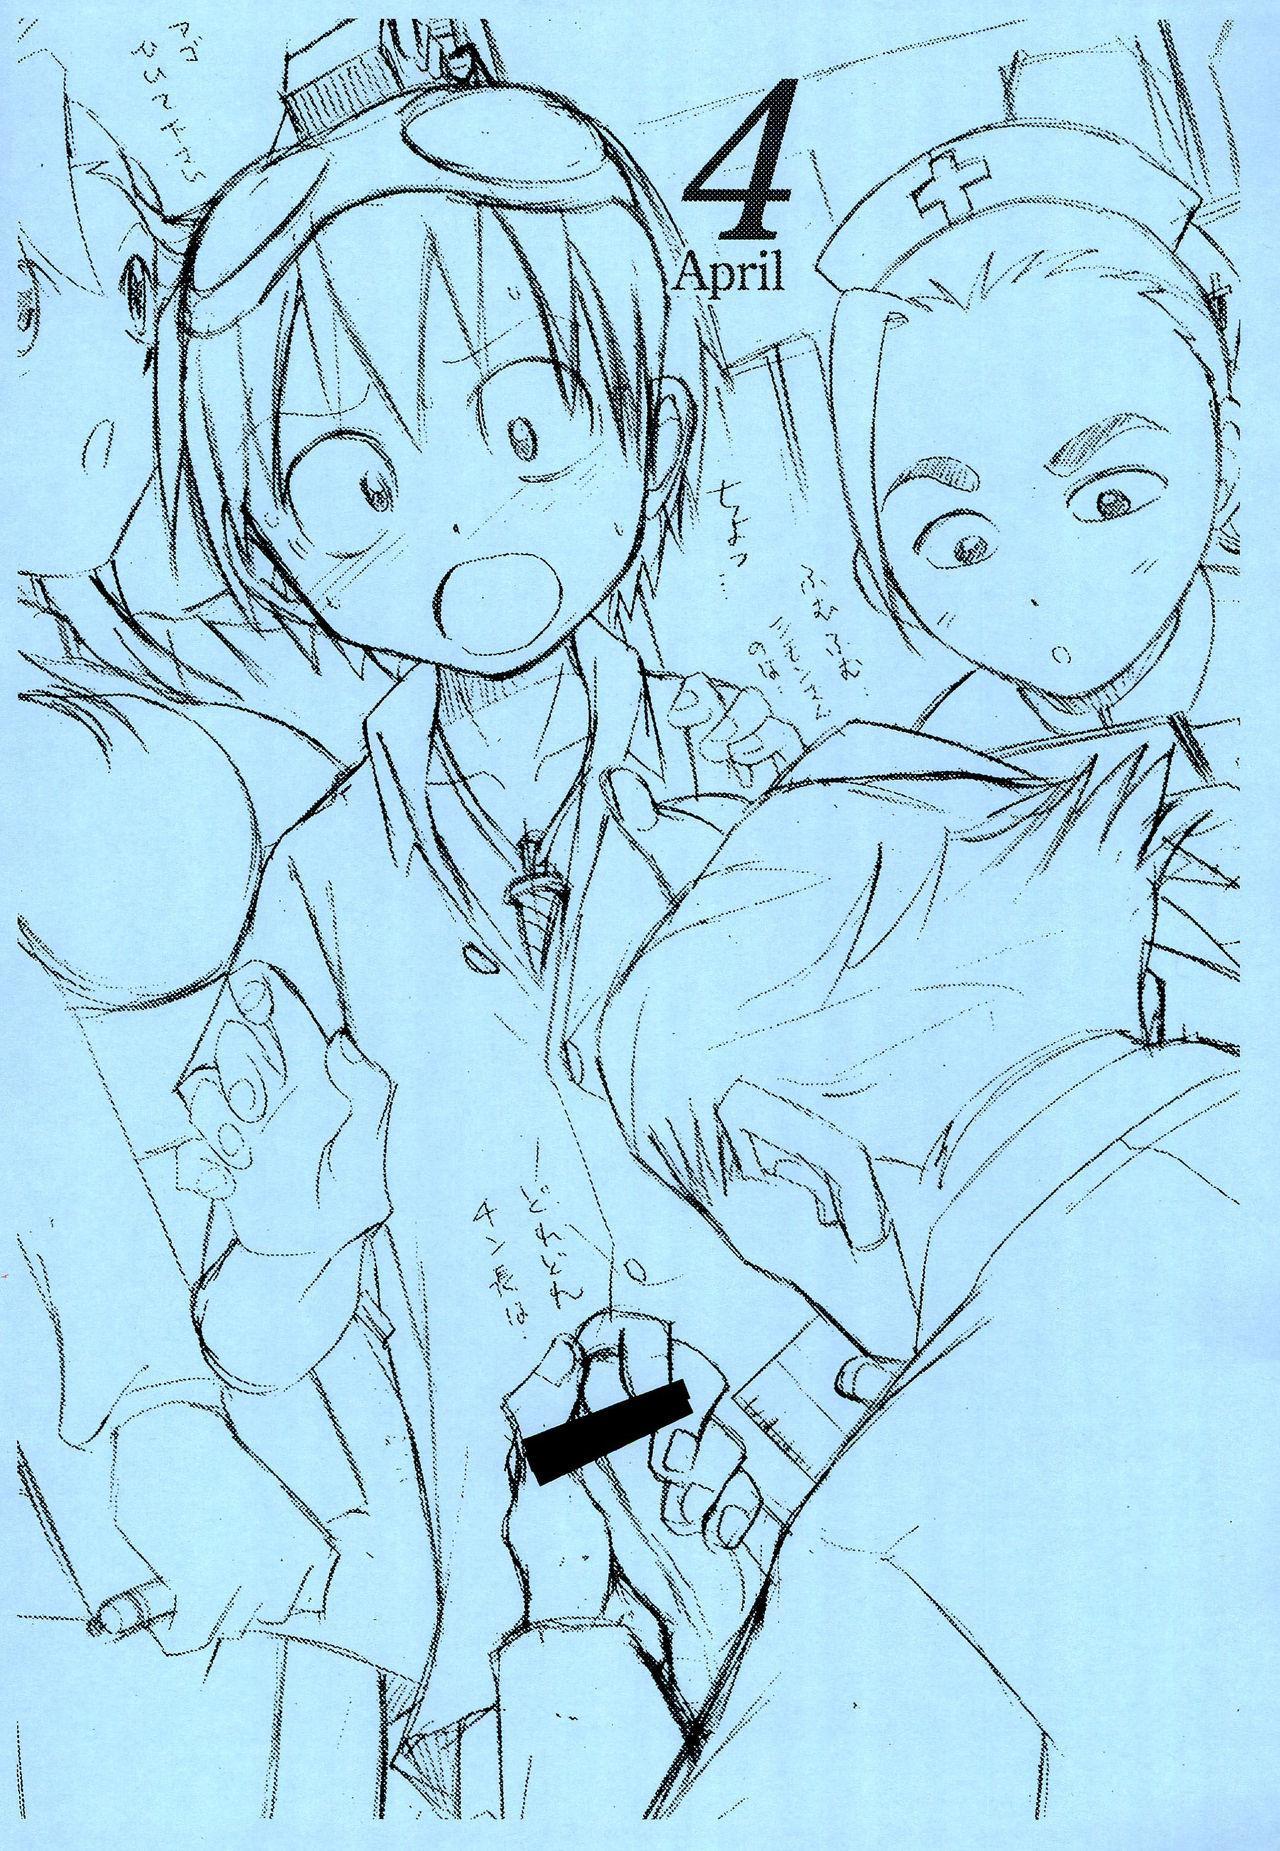 (C72) [Shamon Tei (Shamon)] KamiShimo to Ichinenjuu 2007-nen 9-gatsu - 2008-nen 8-gatsu Calendar (Gurren Lagann) 8